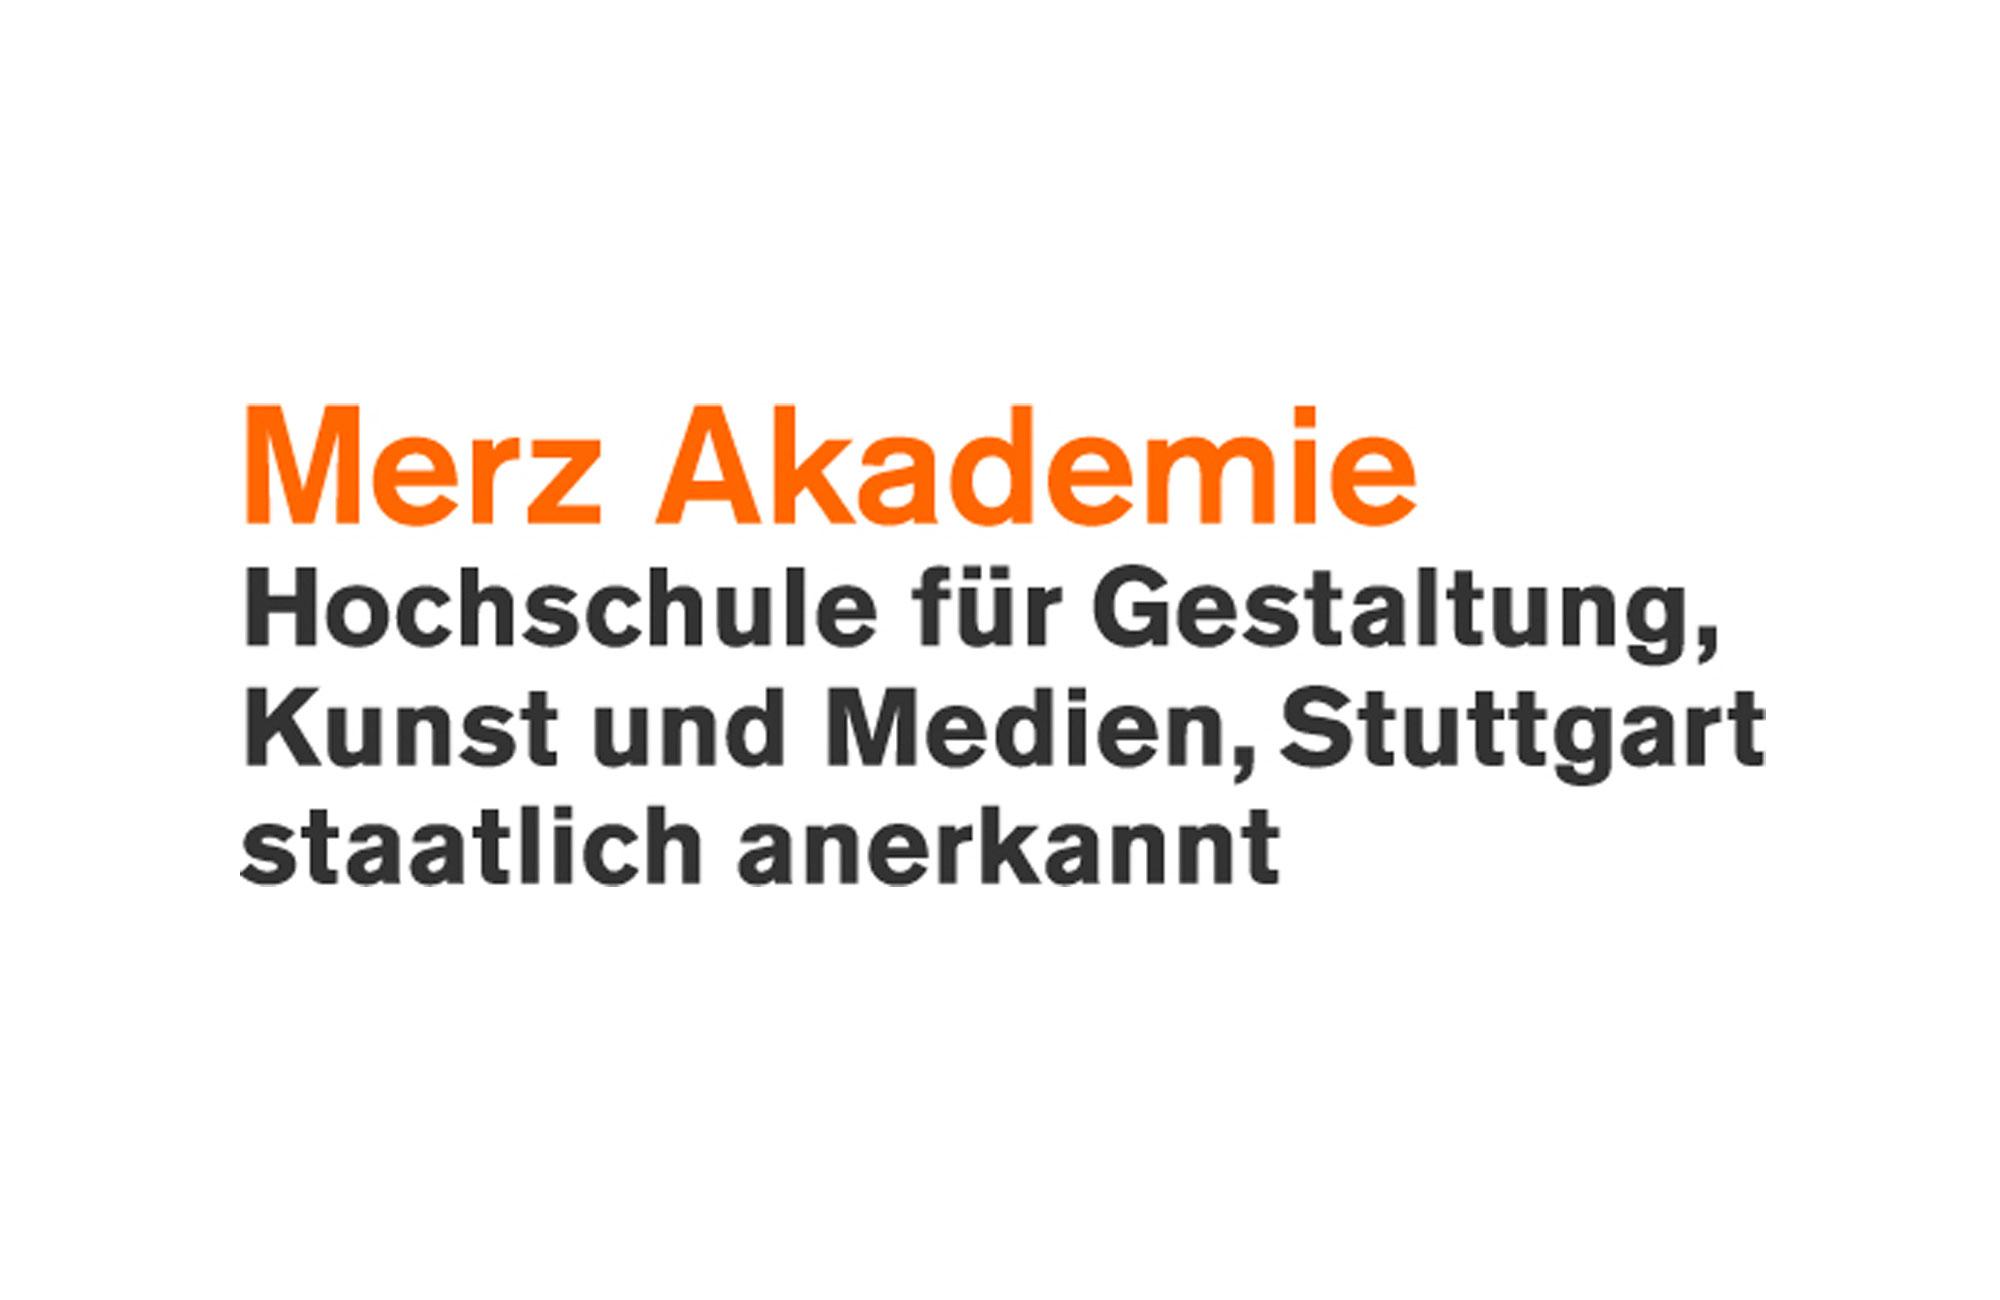 Logo Merz Akademie (Stuttgart)